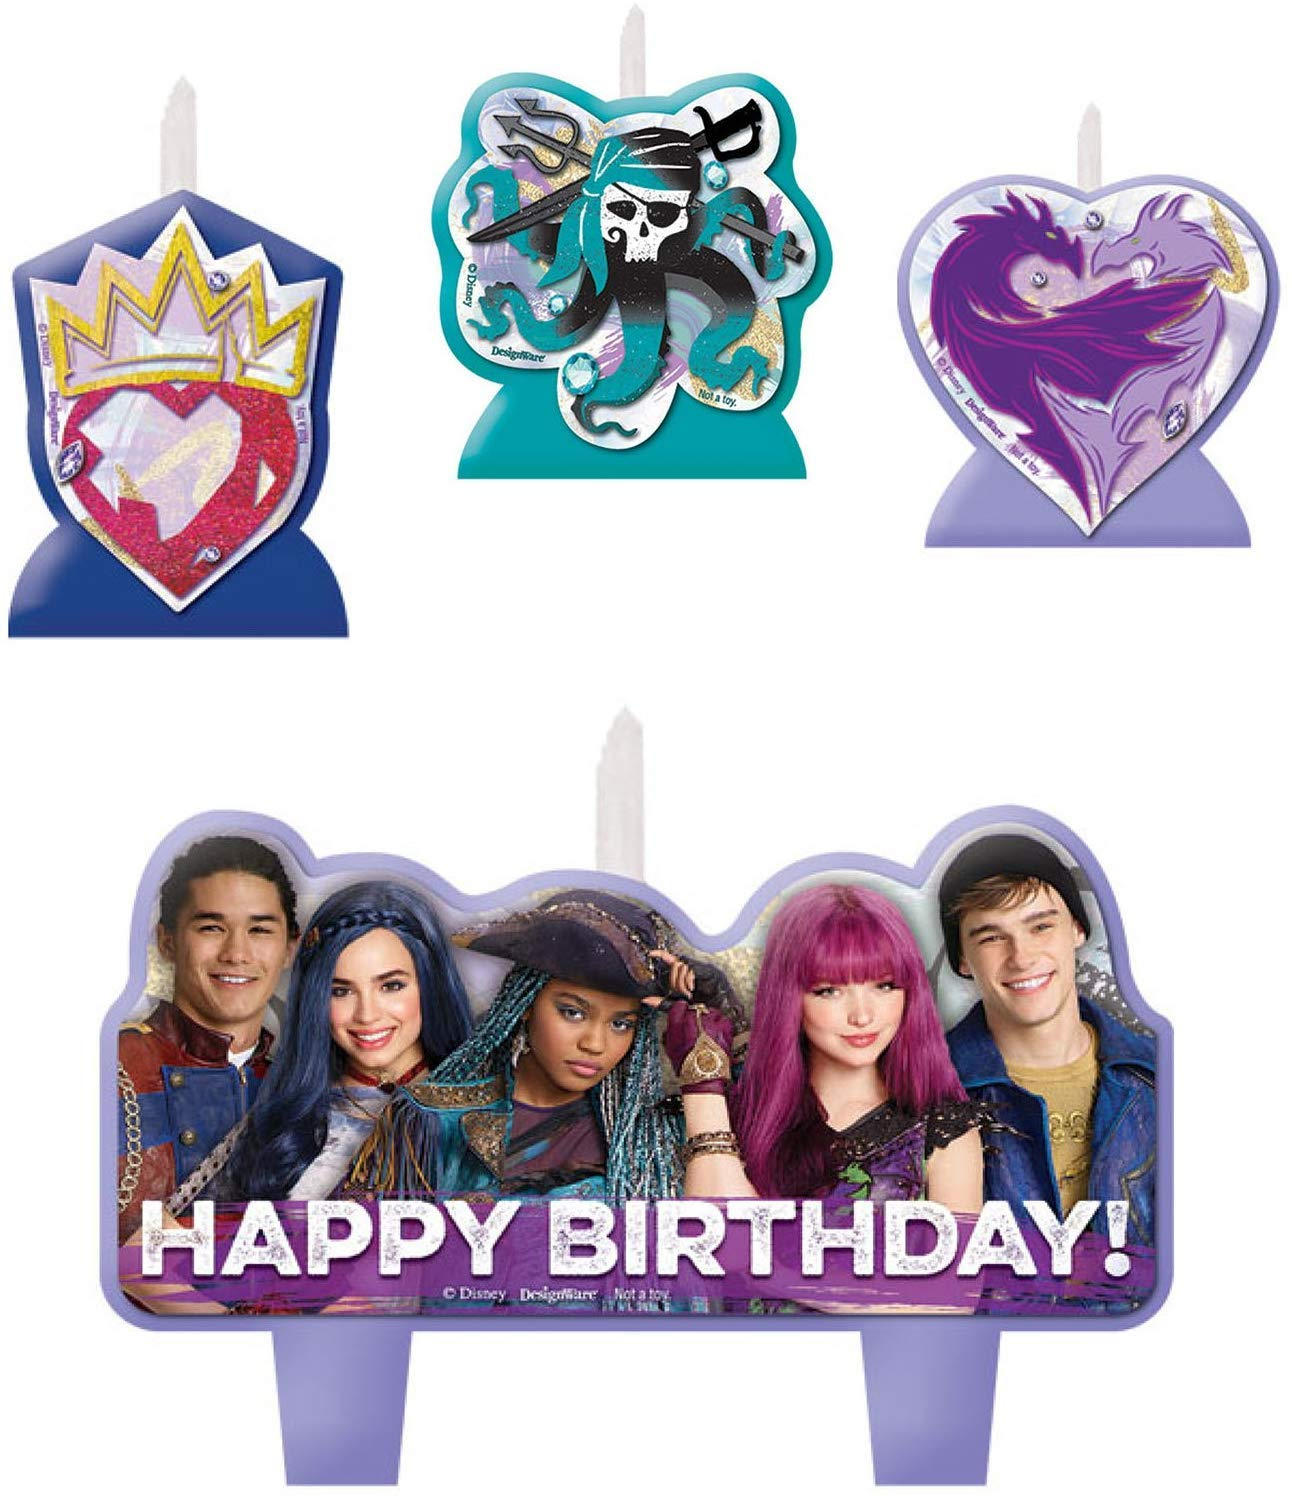 Amazon.com: Disney Descendants 2 Vela de cumpleaños set ...